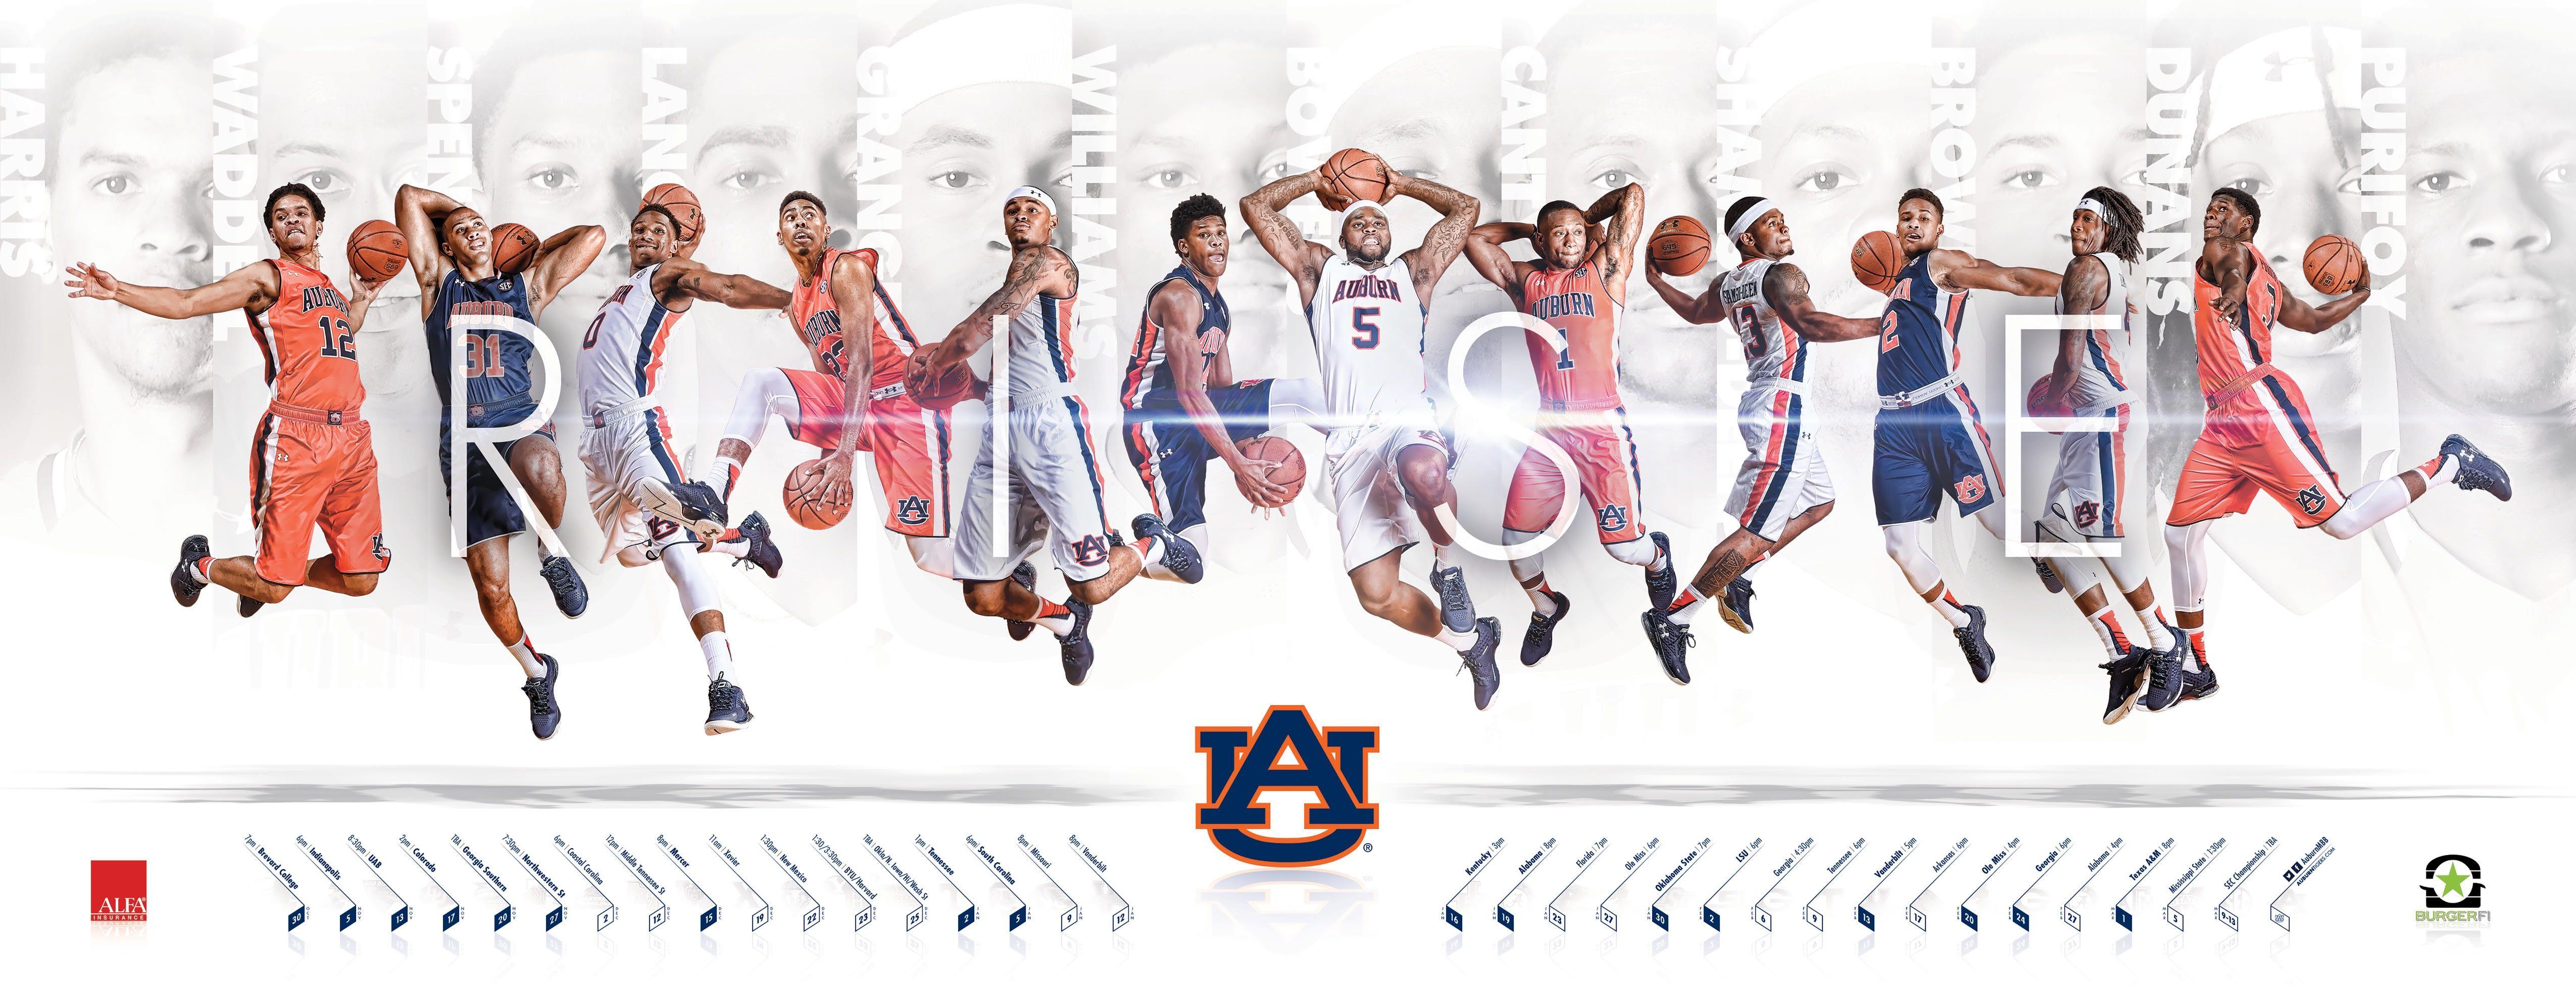 Poster Swag Basketball Posters Basketball Design College Basketball